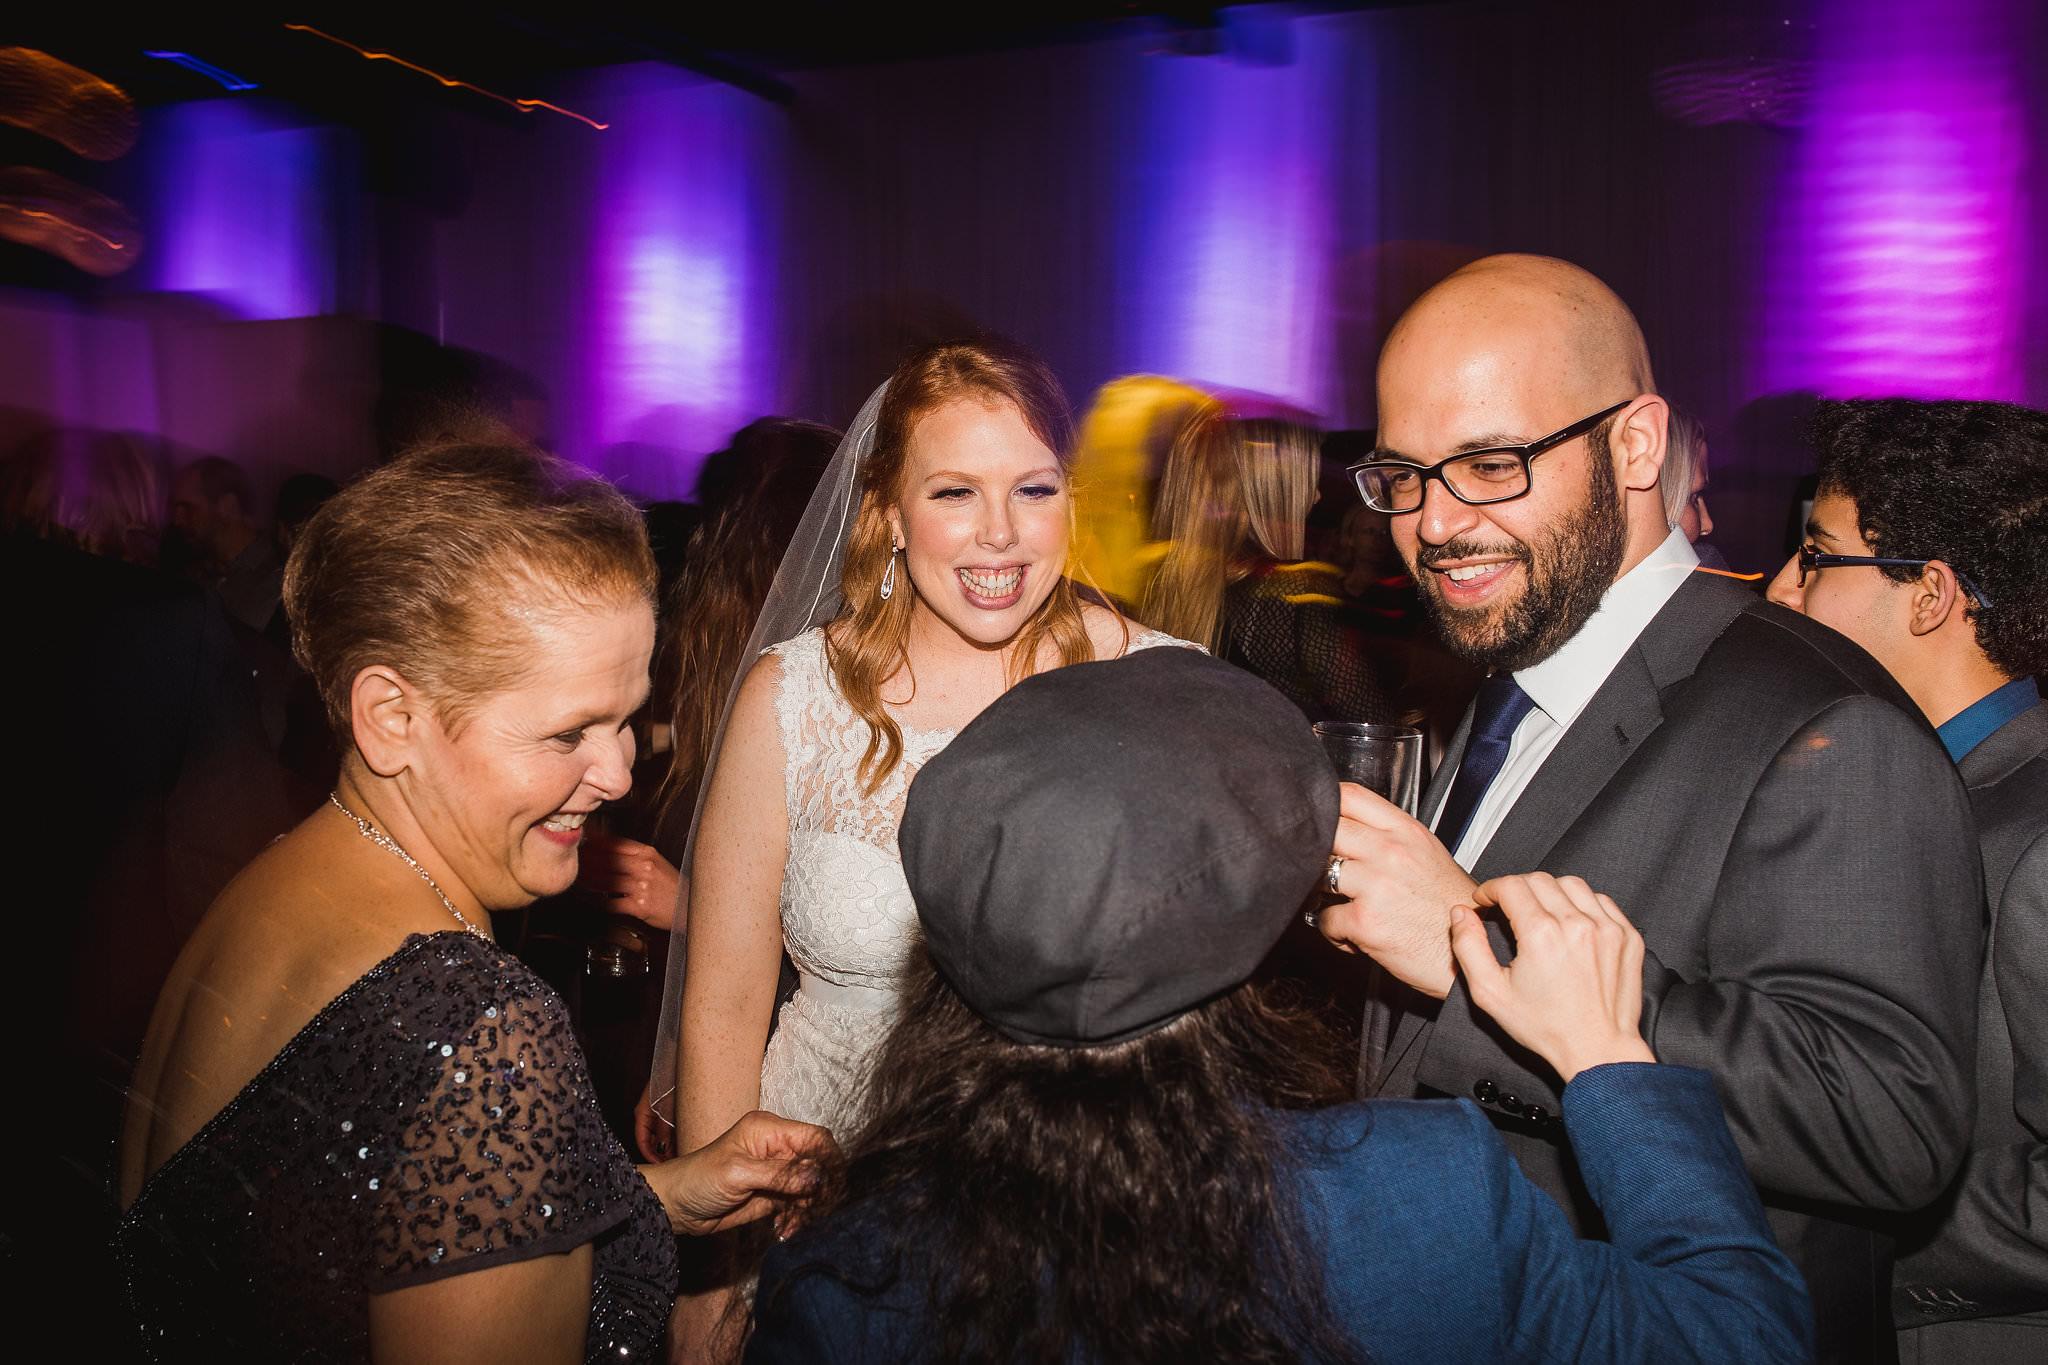 york mills gallery wedding reception dancing